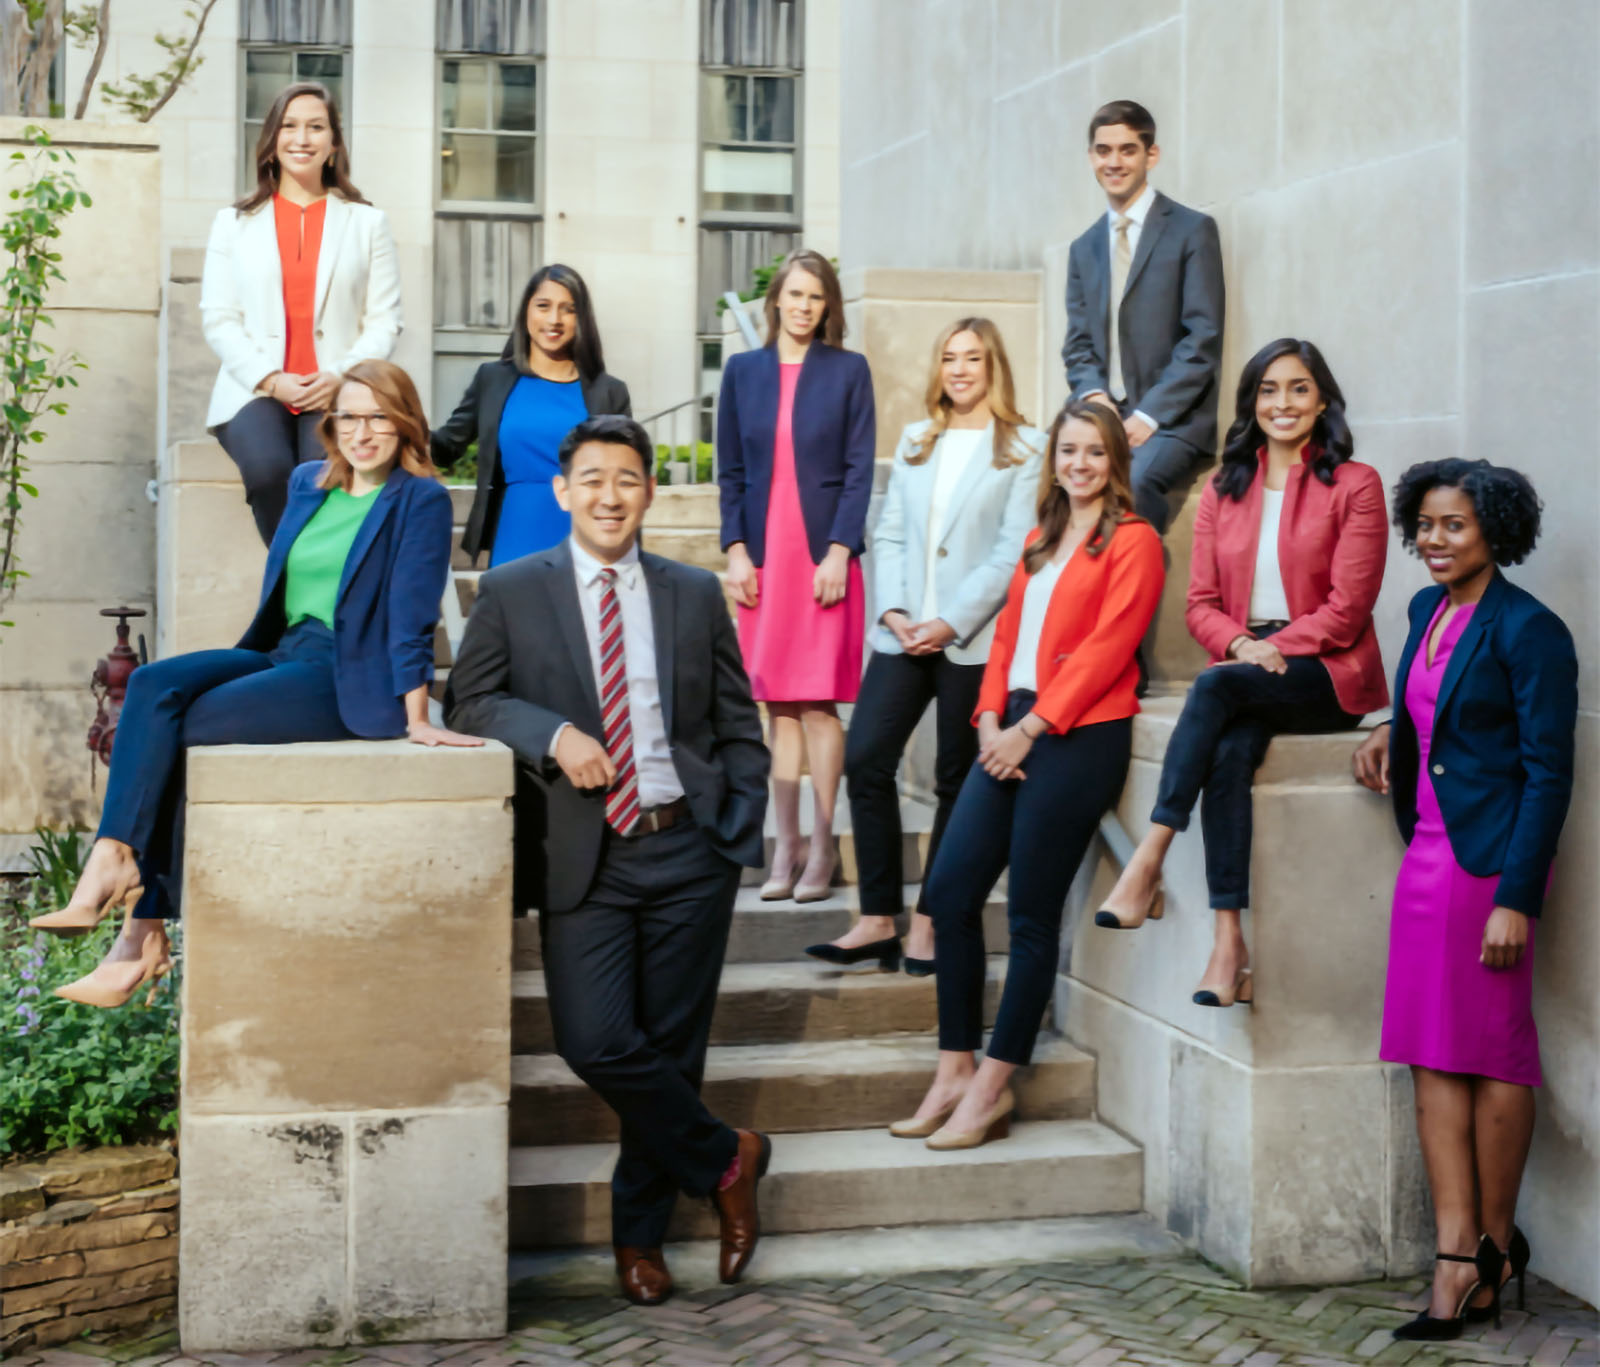 MSNBC 2020 Political Reporting Team